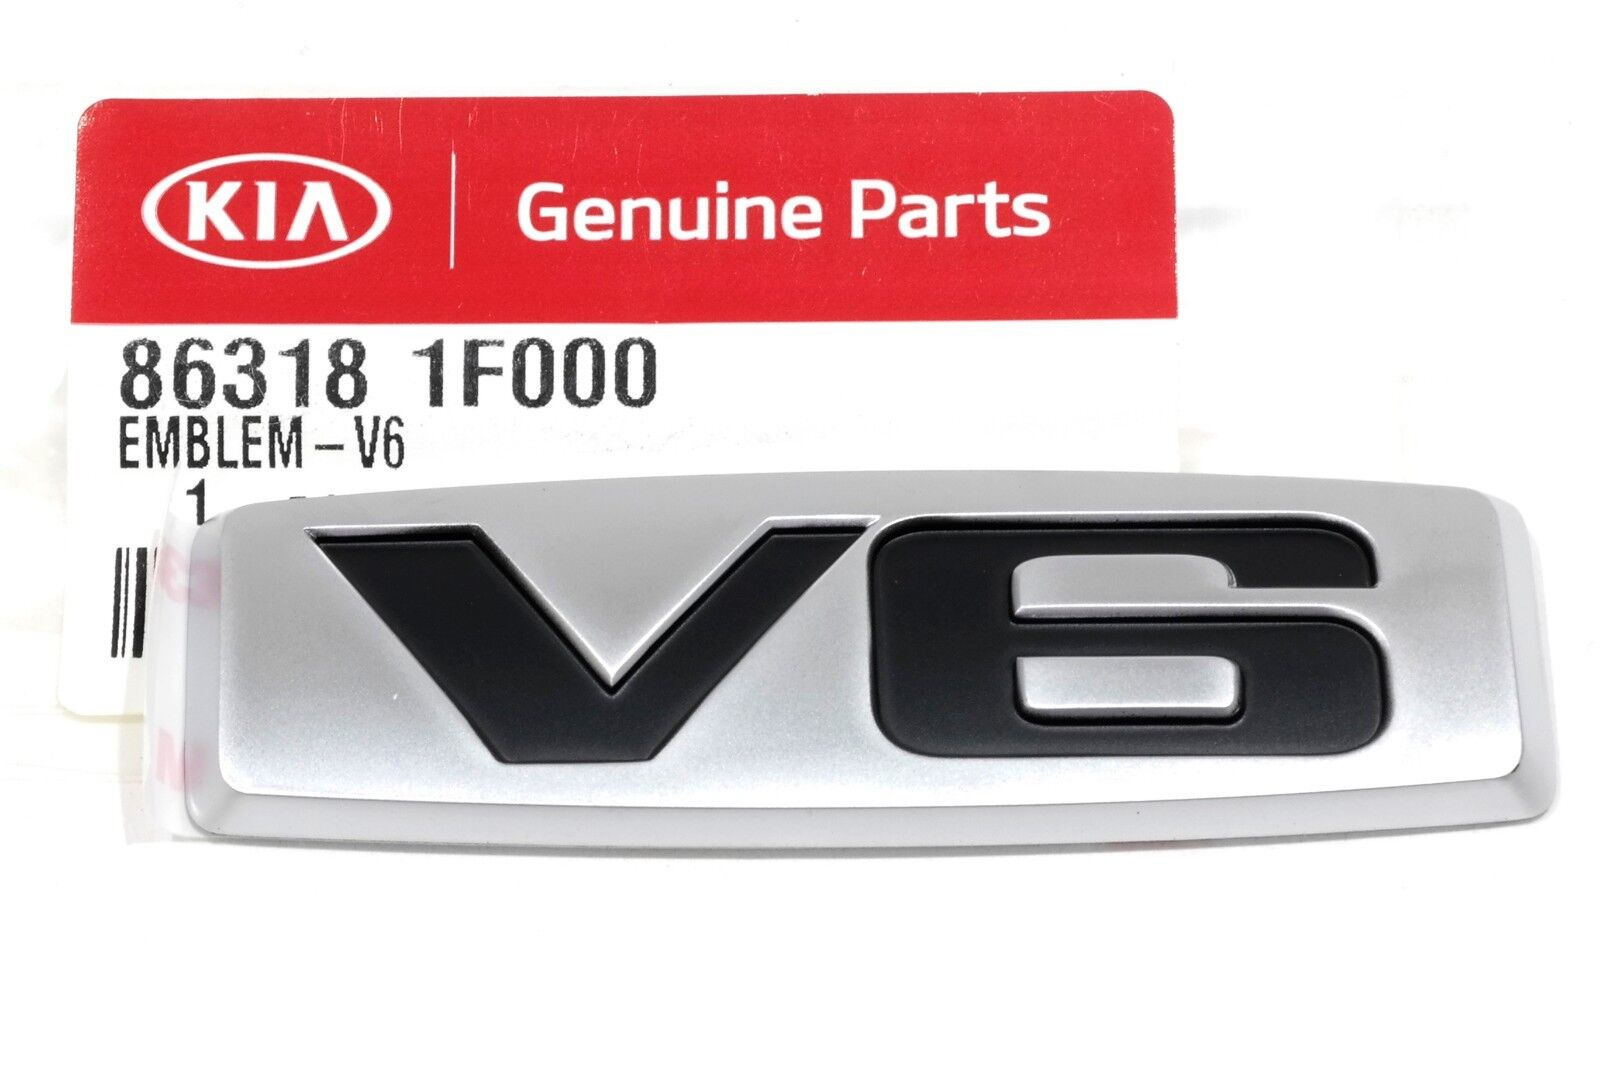 Kia Genuine 86318-1F000 Emblem